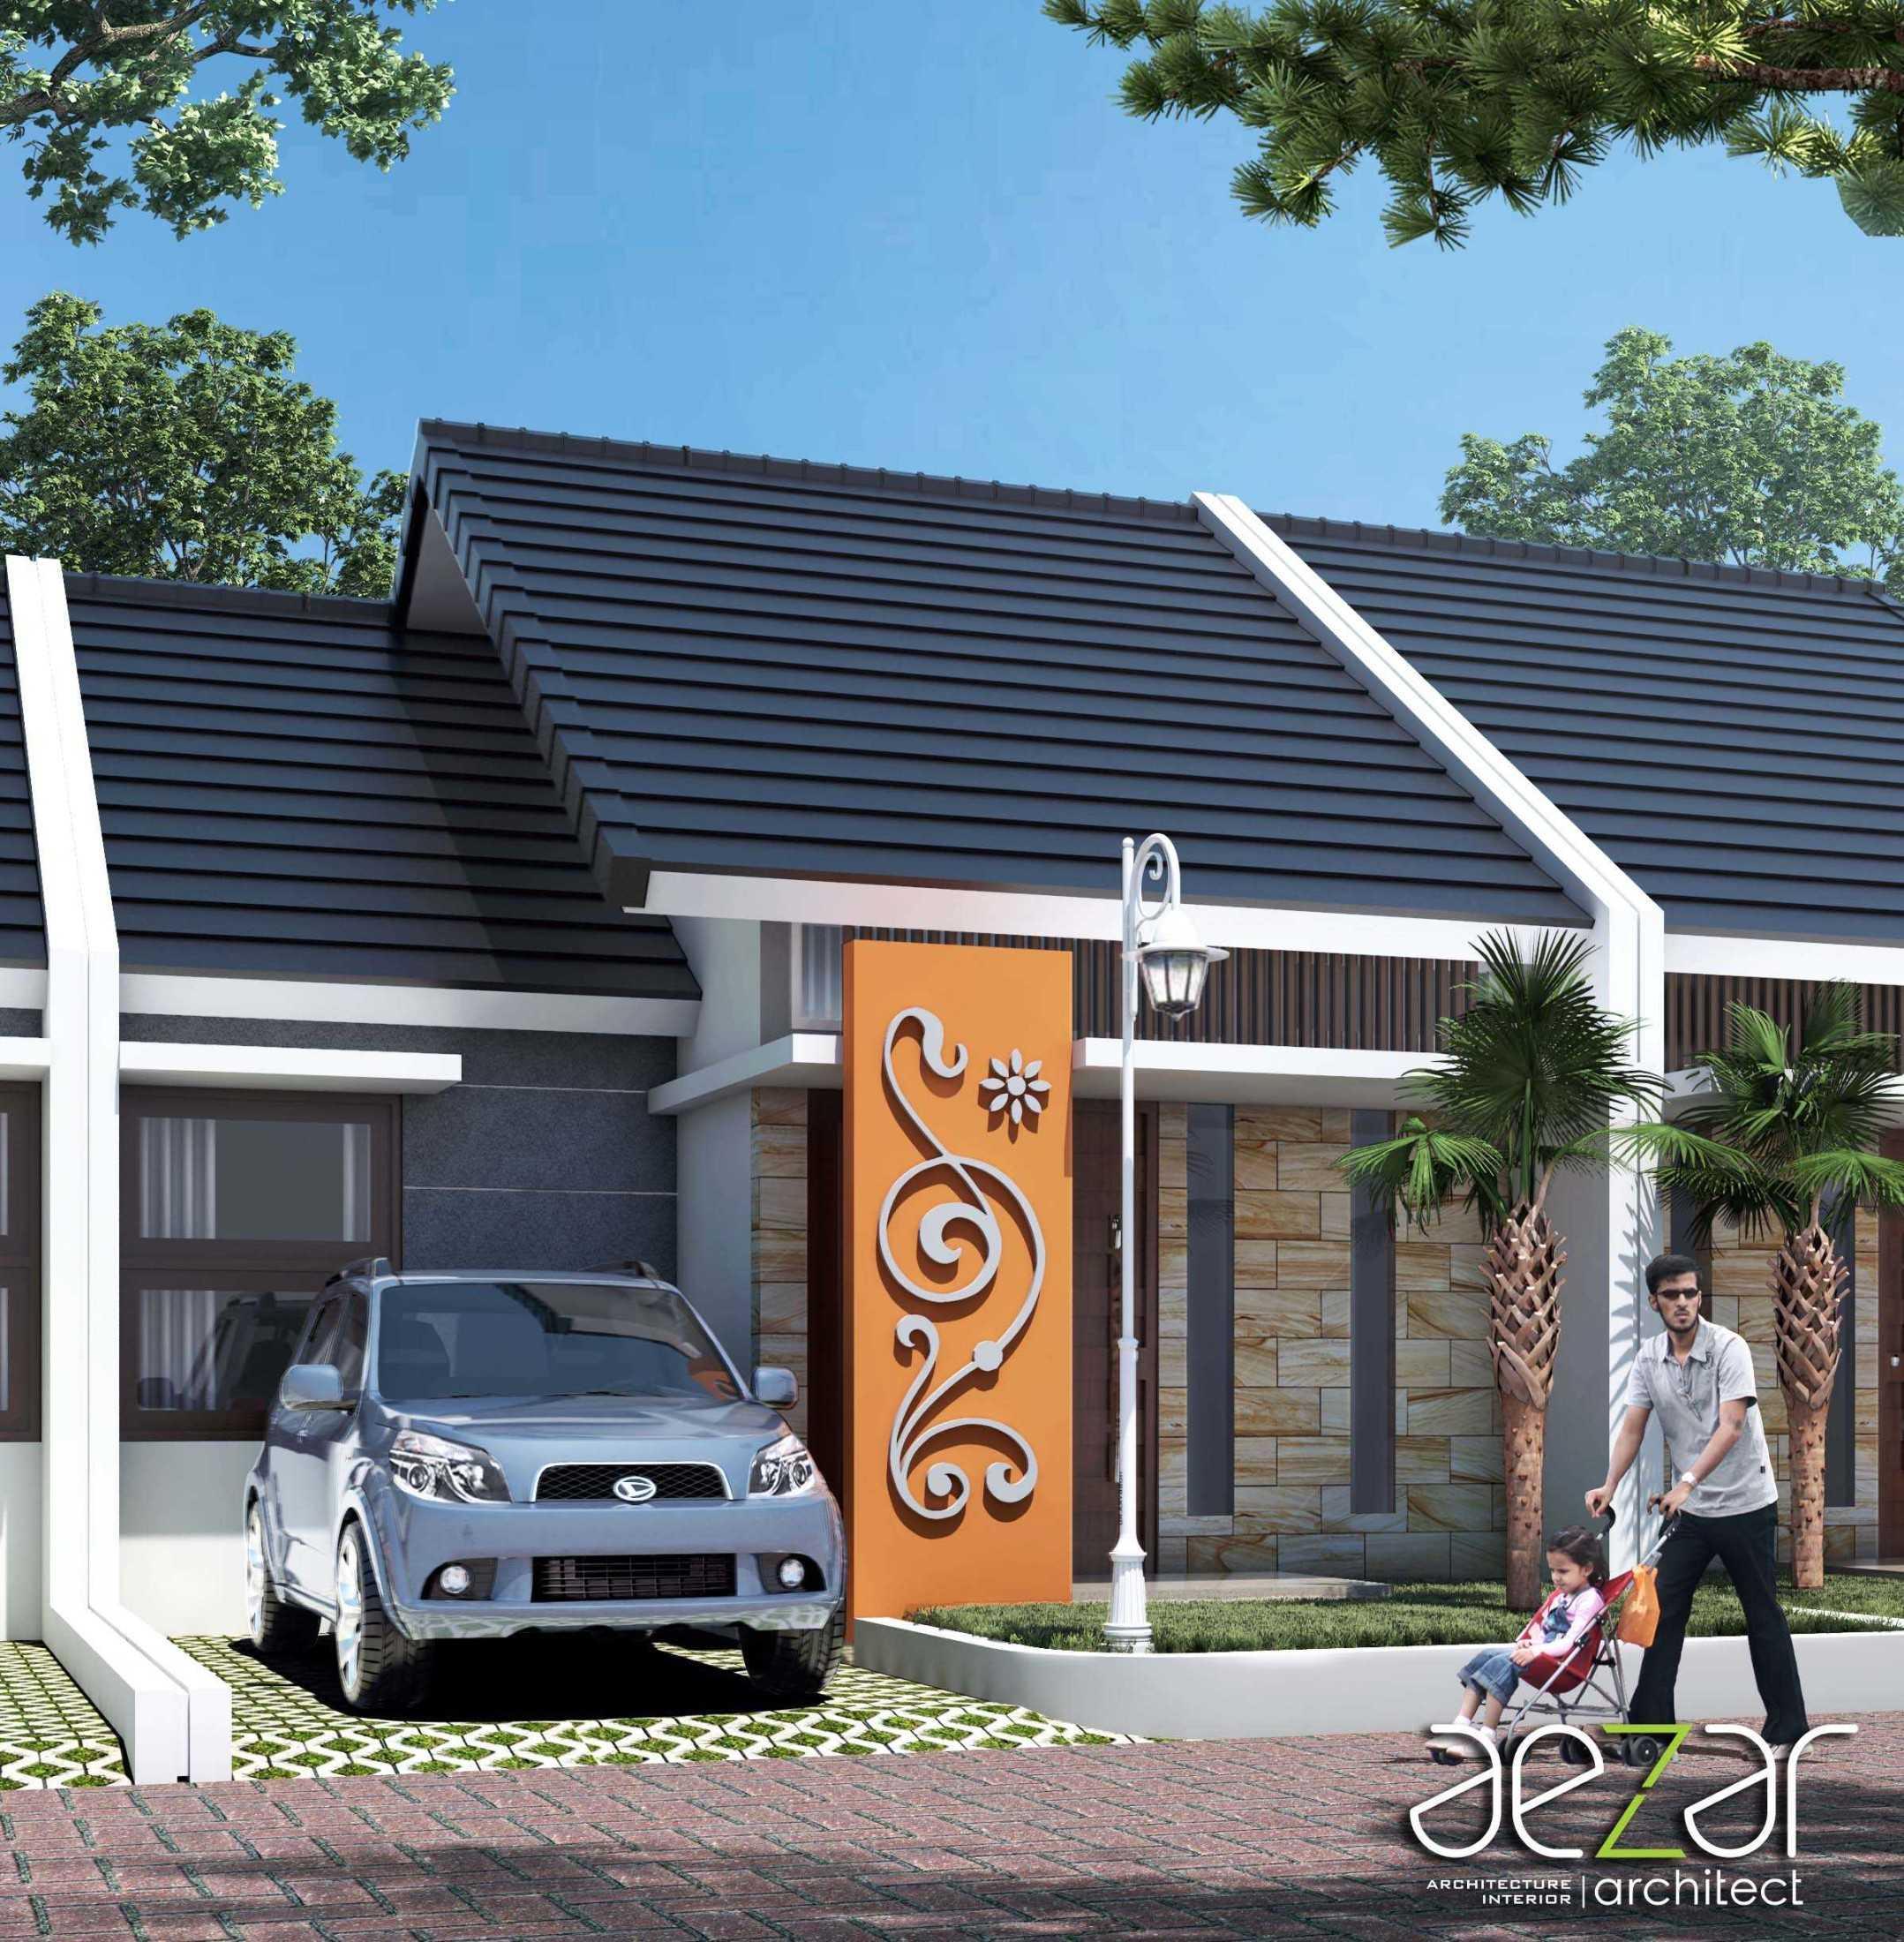 Aezar Architect Perumahan Villa Exist Sempurna Kabupaten Batang, Jawa Tengah, Indonesia Kabupaten Batang, Jawa Tengah, Indonesia Exterior View Minimalis 54485